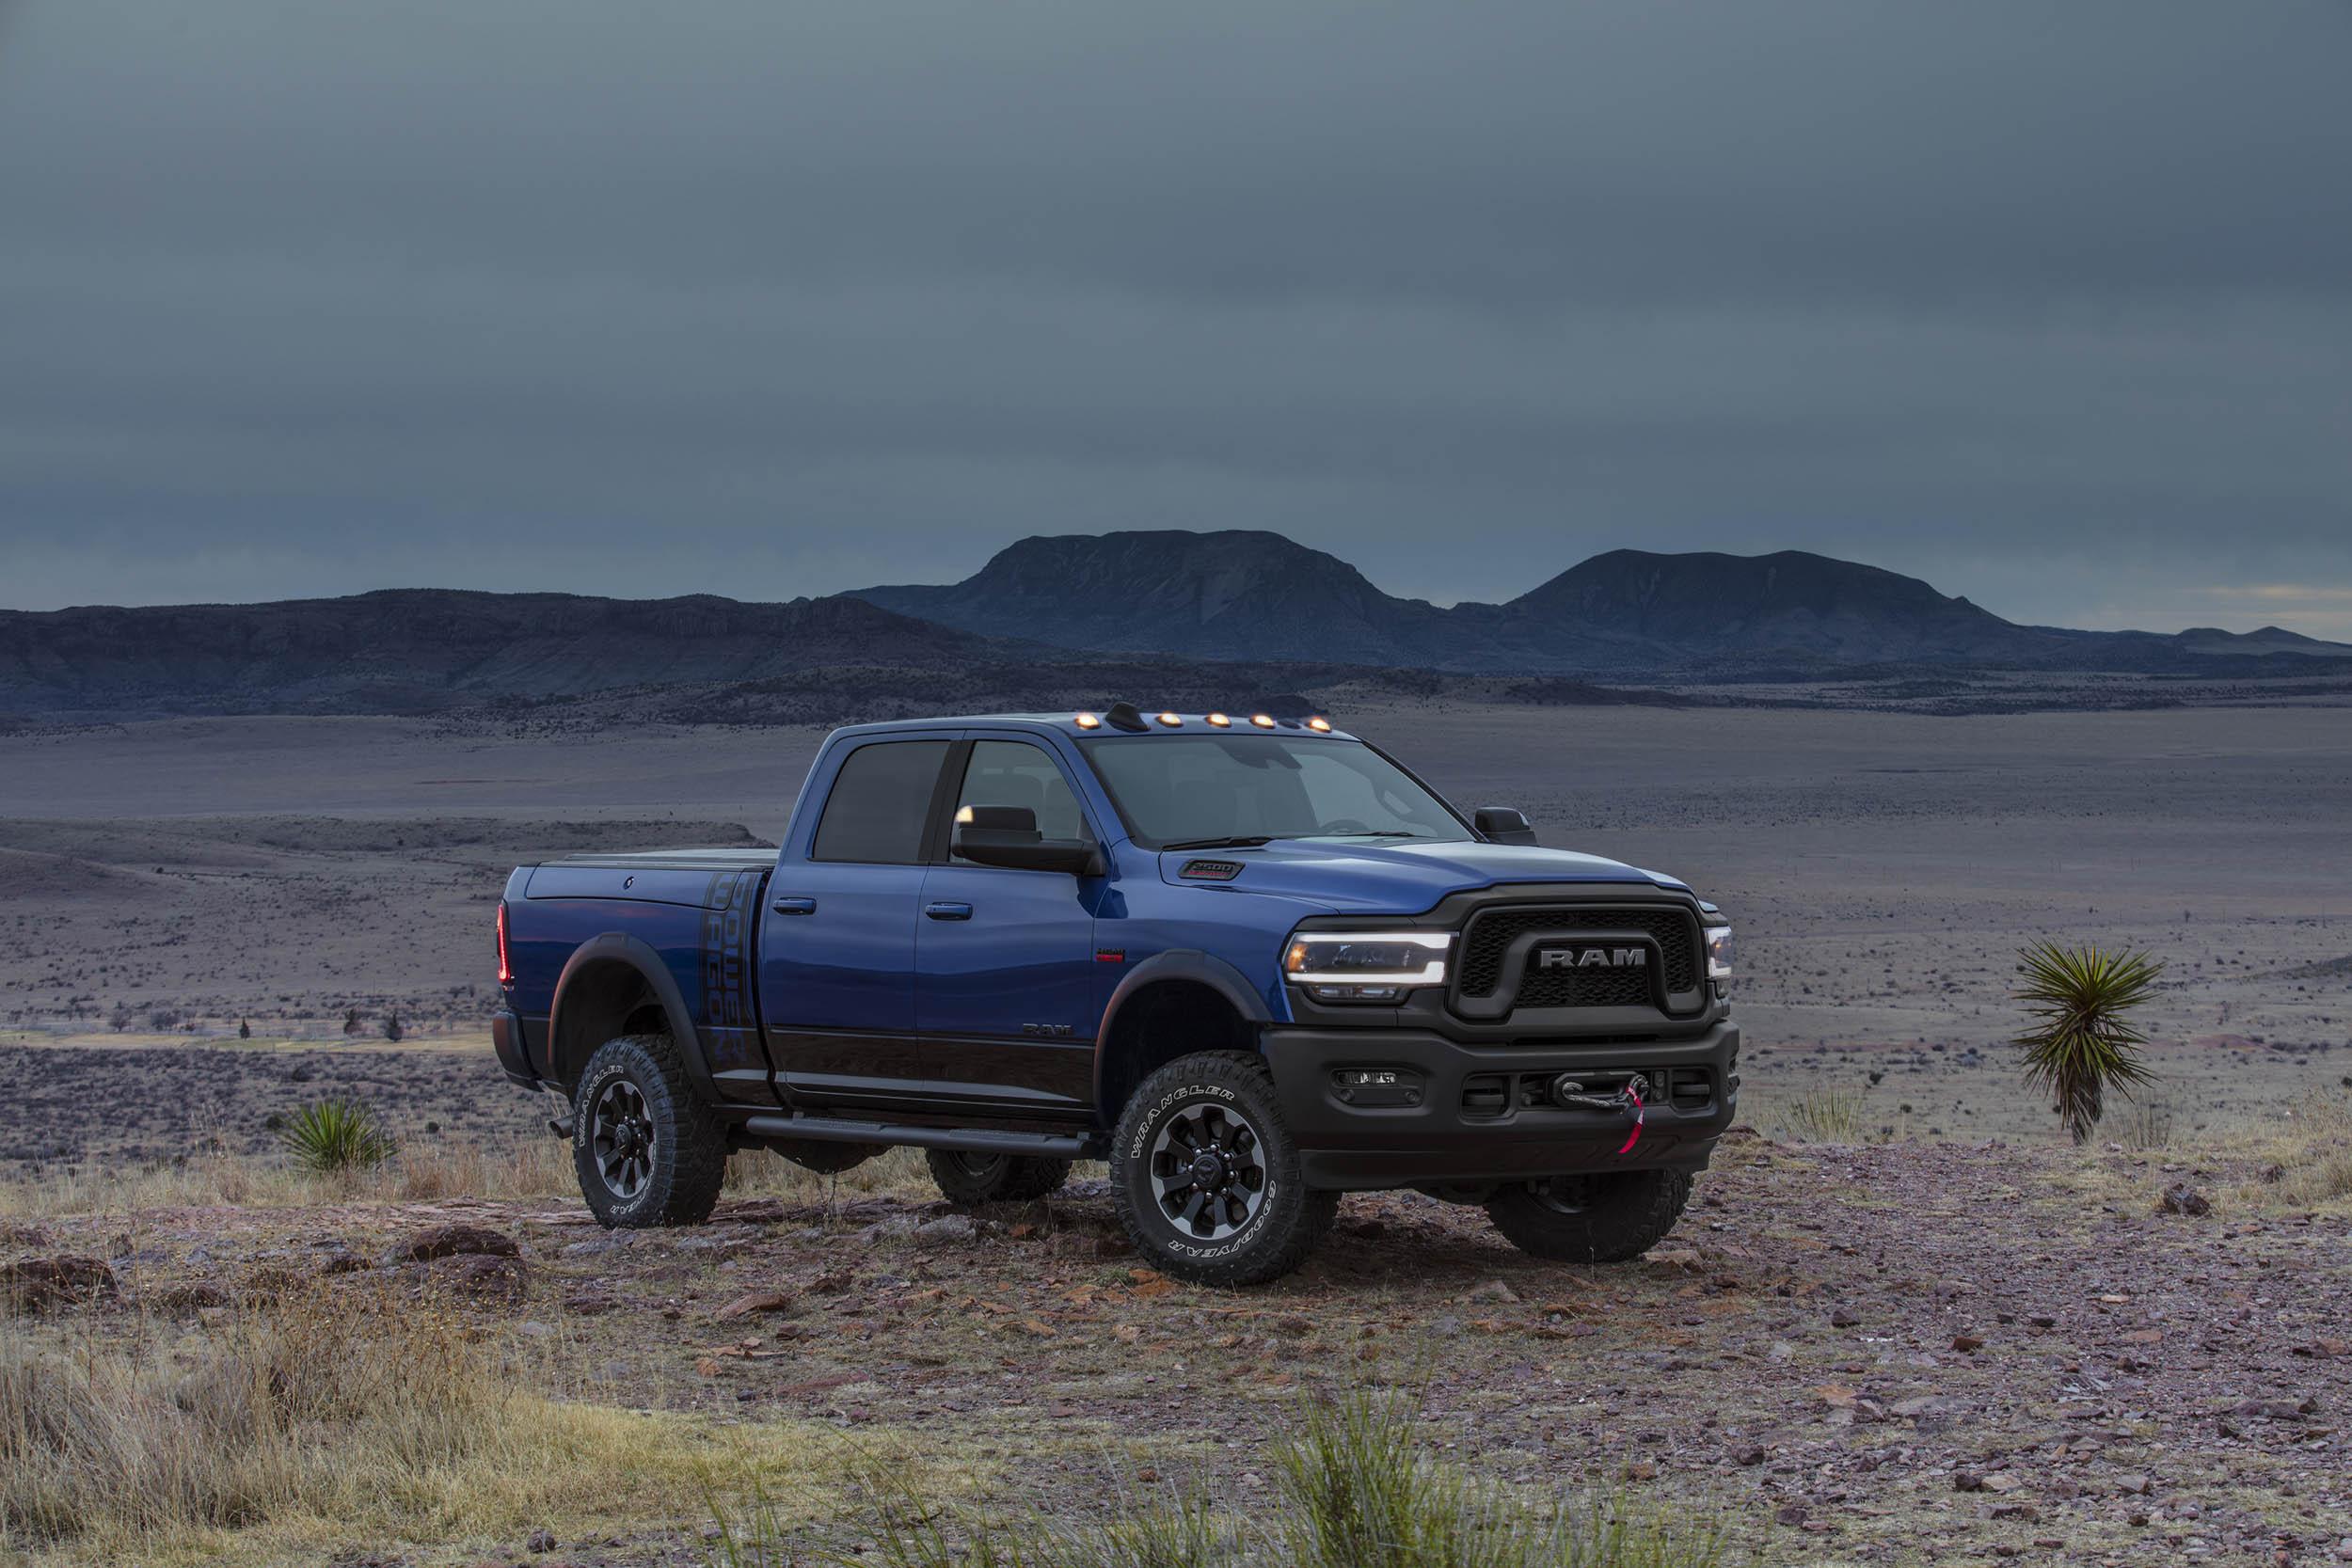 2019 RAM Power Wagon front 3/4